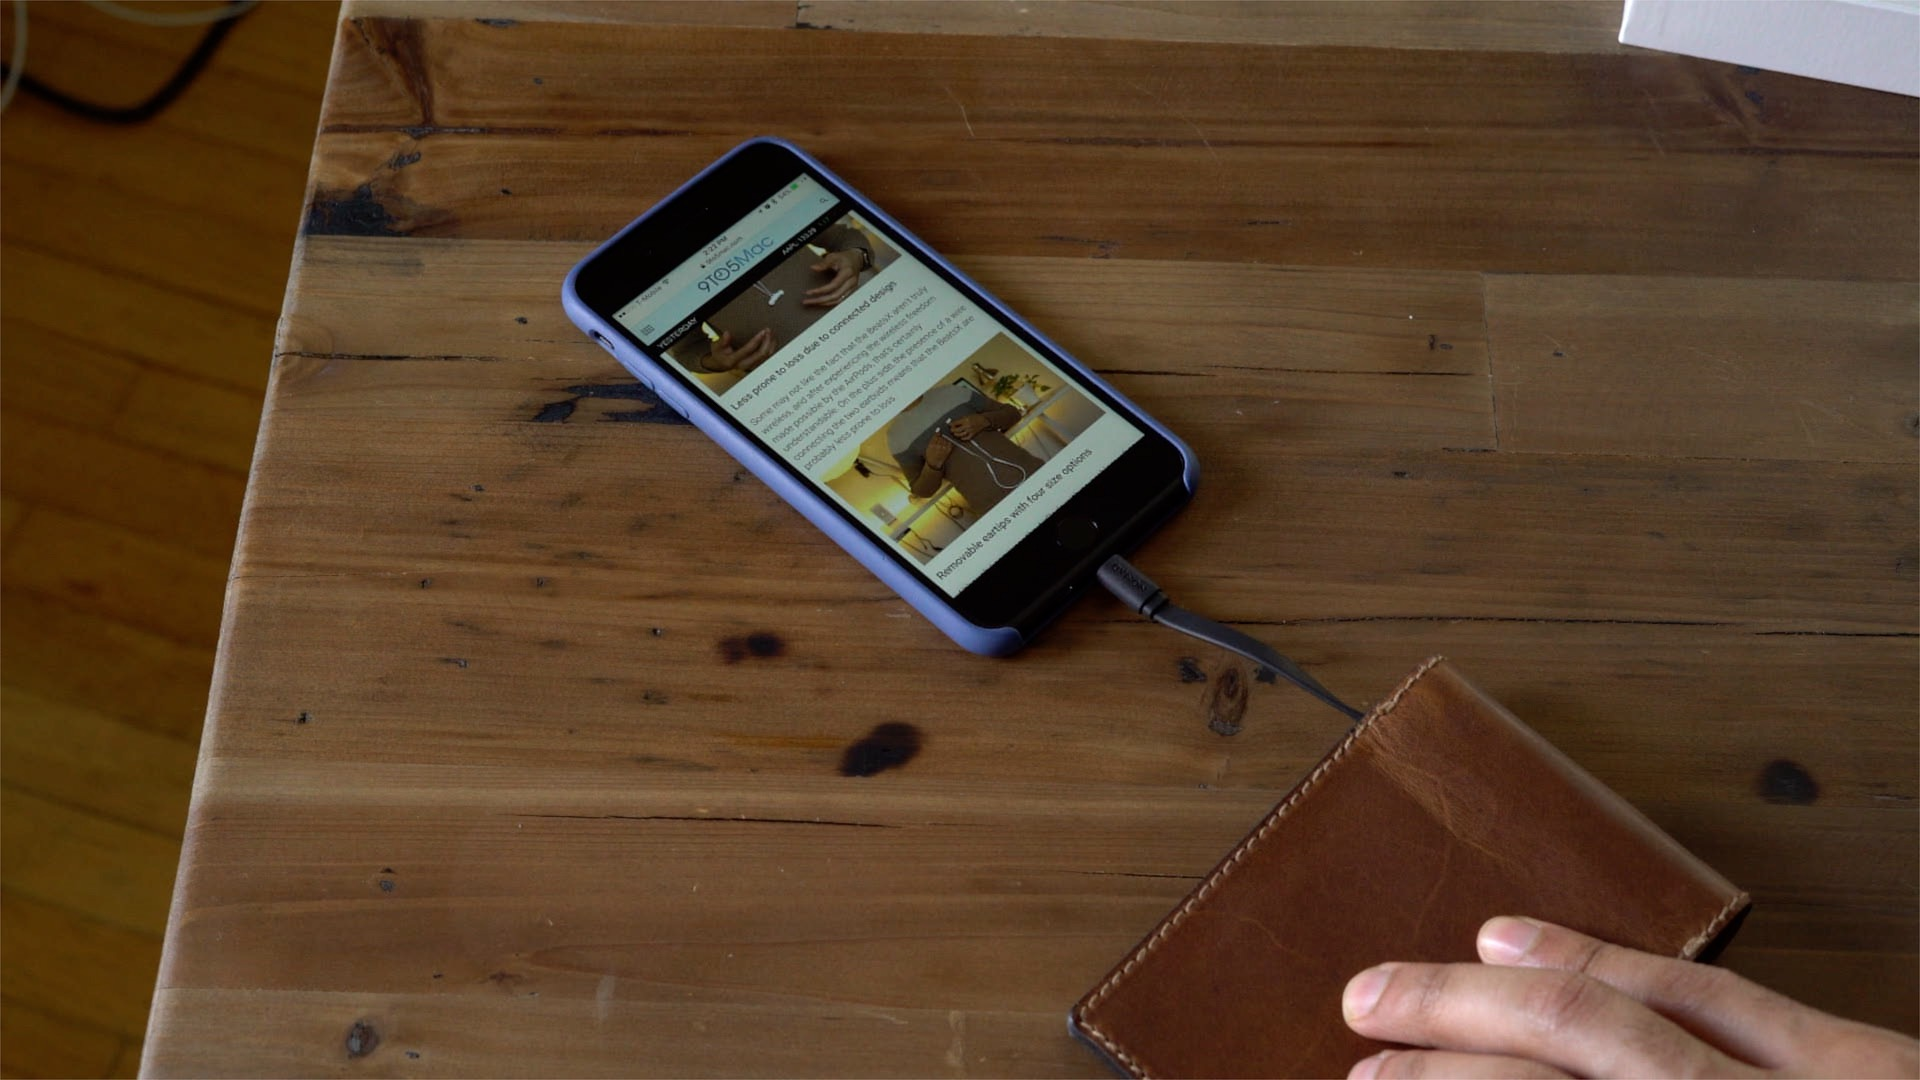 nomad-leather-wallet-integrated-battery-mfi-lightning-hands-on-08